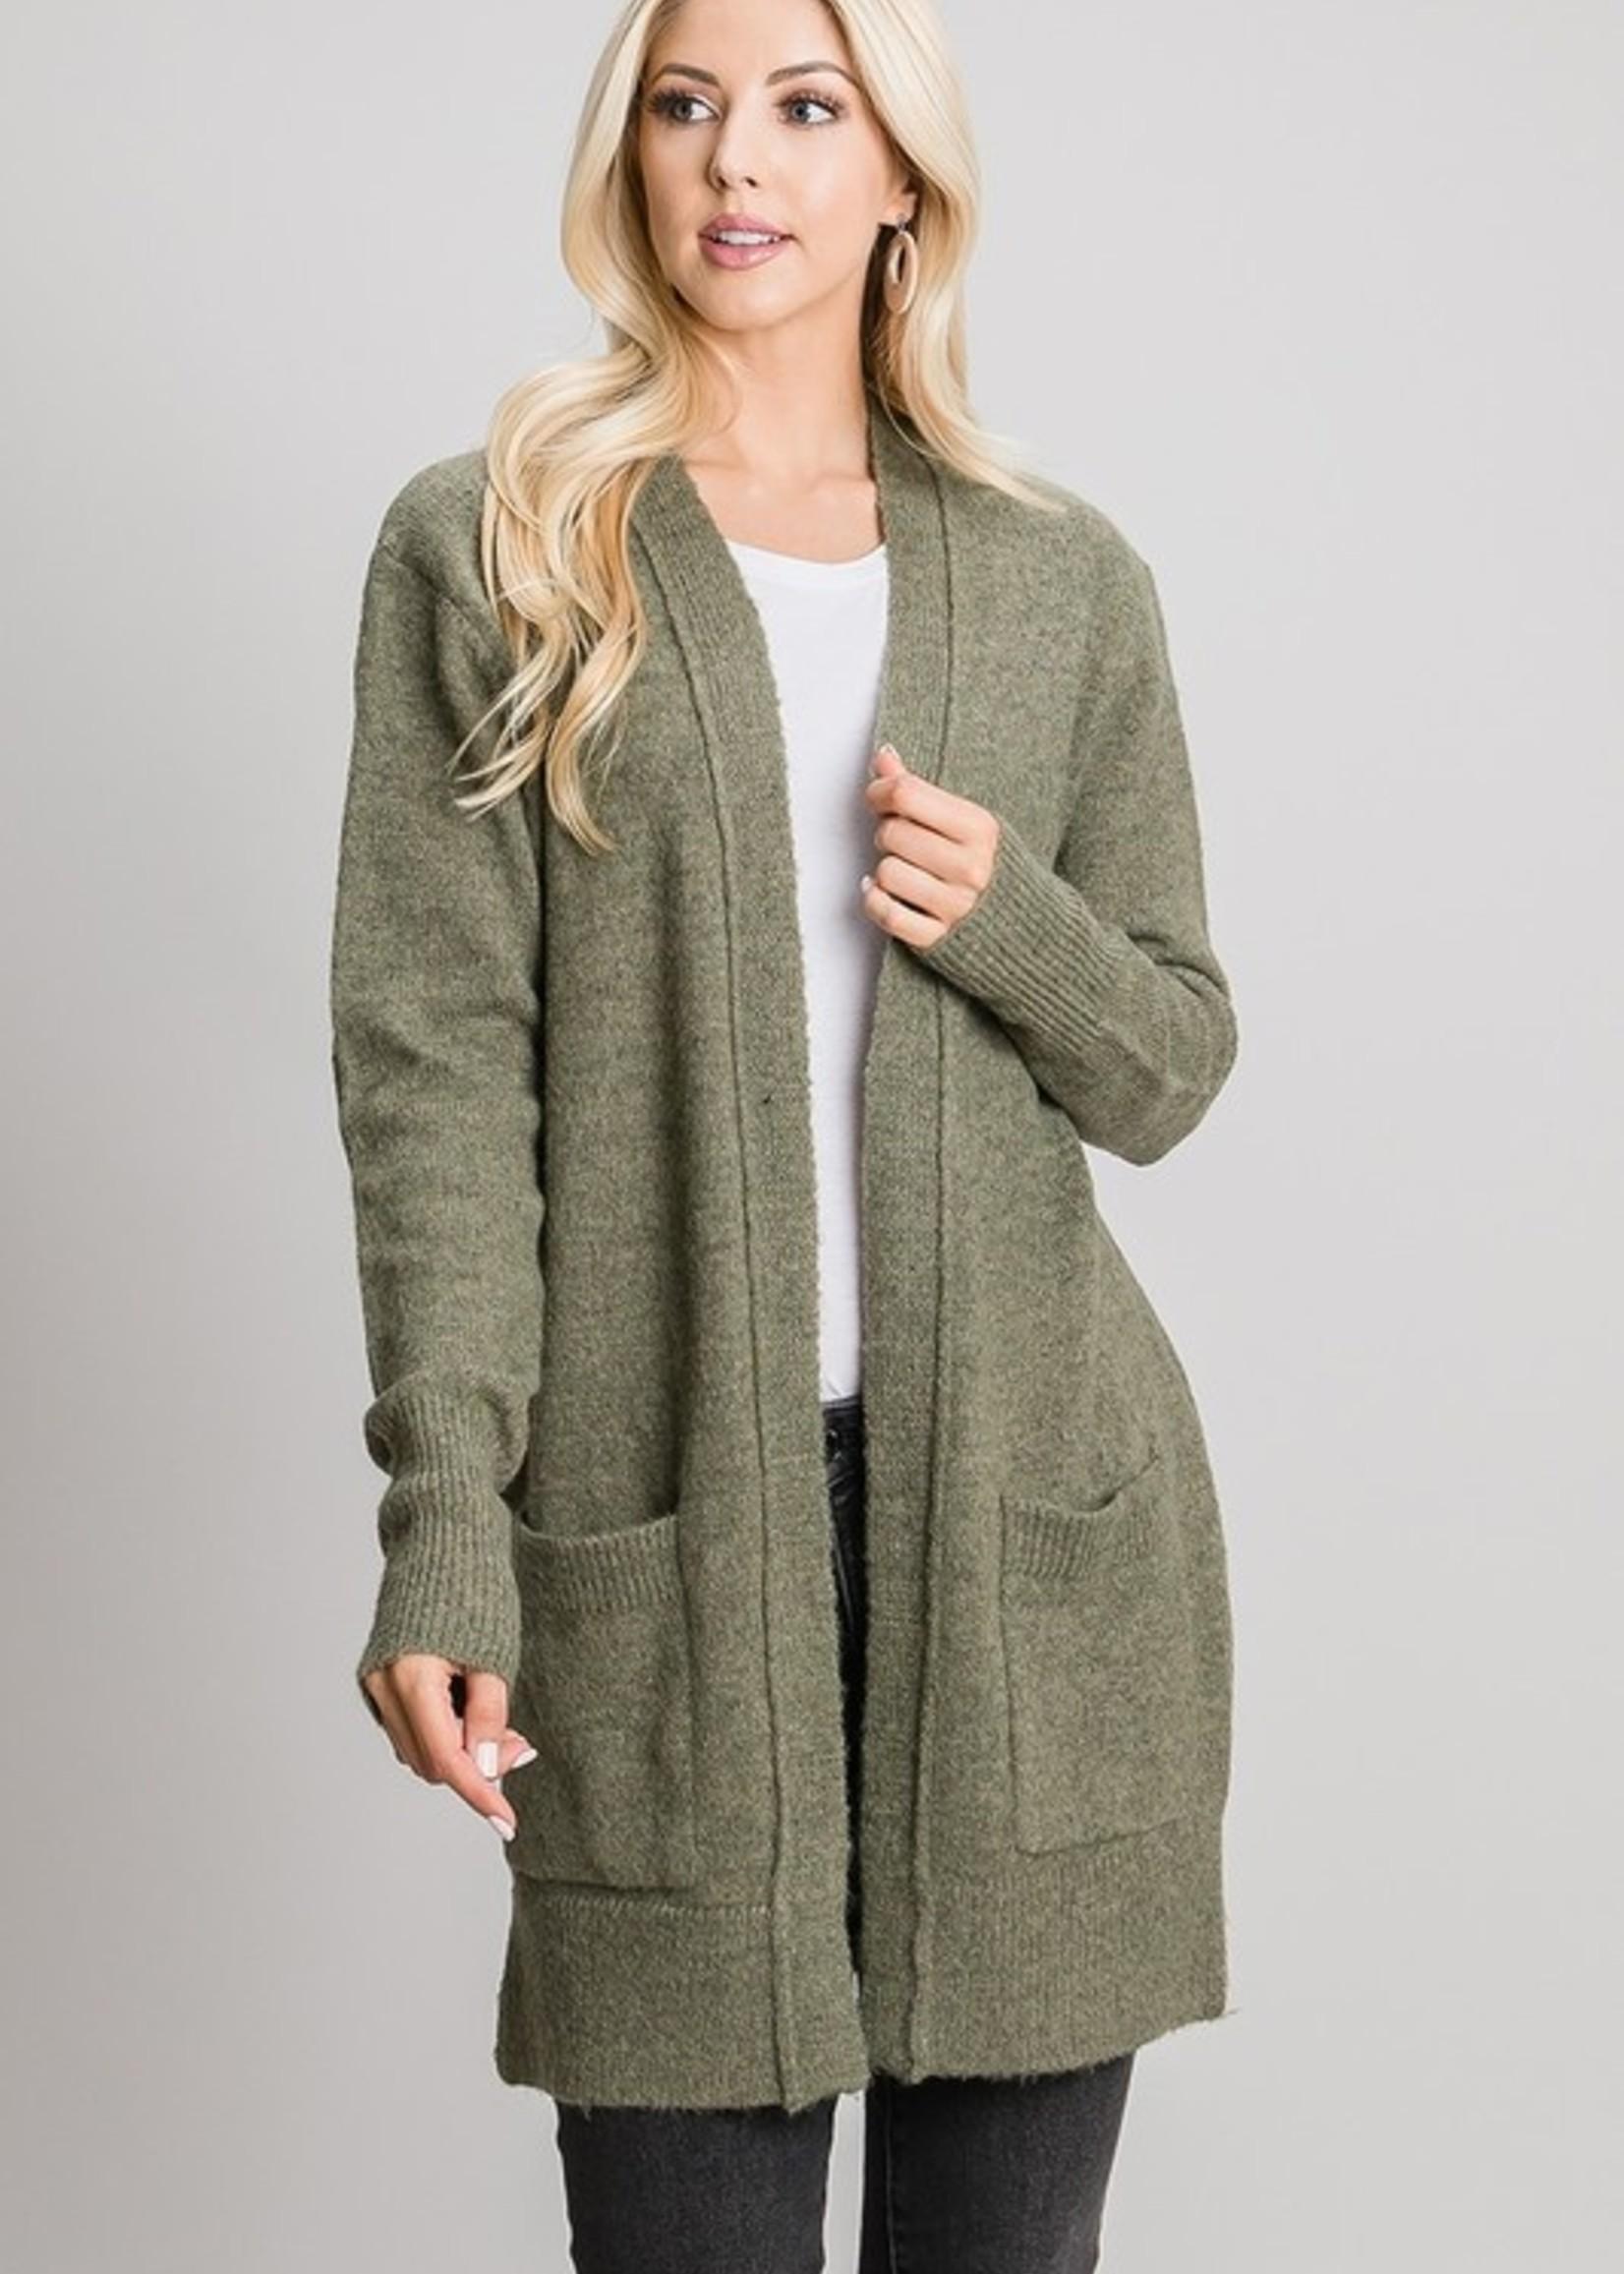 Sweater Cardigan - Olive